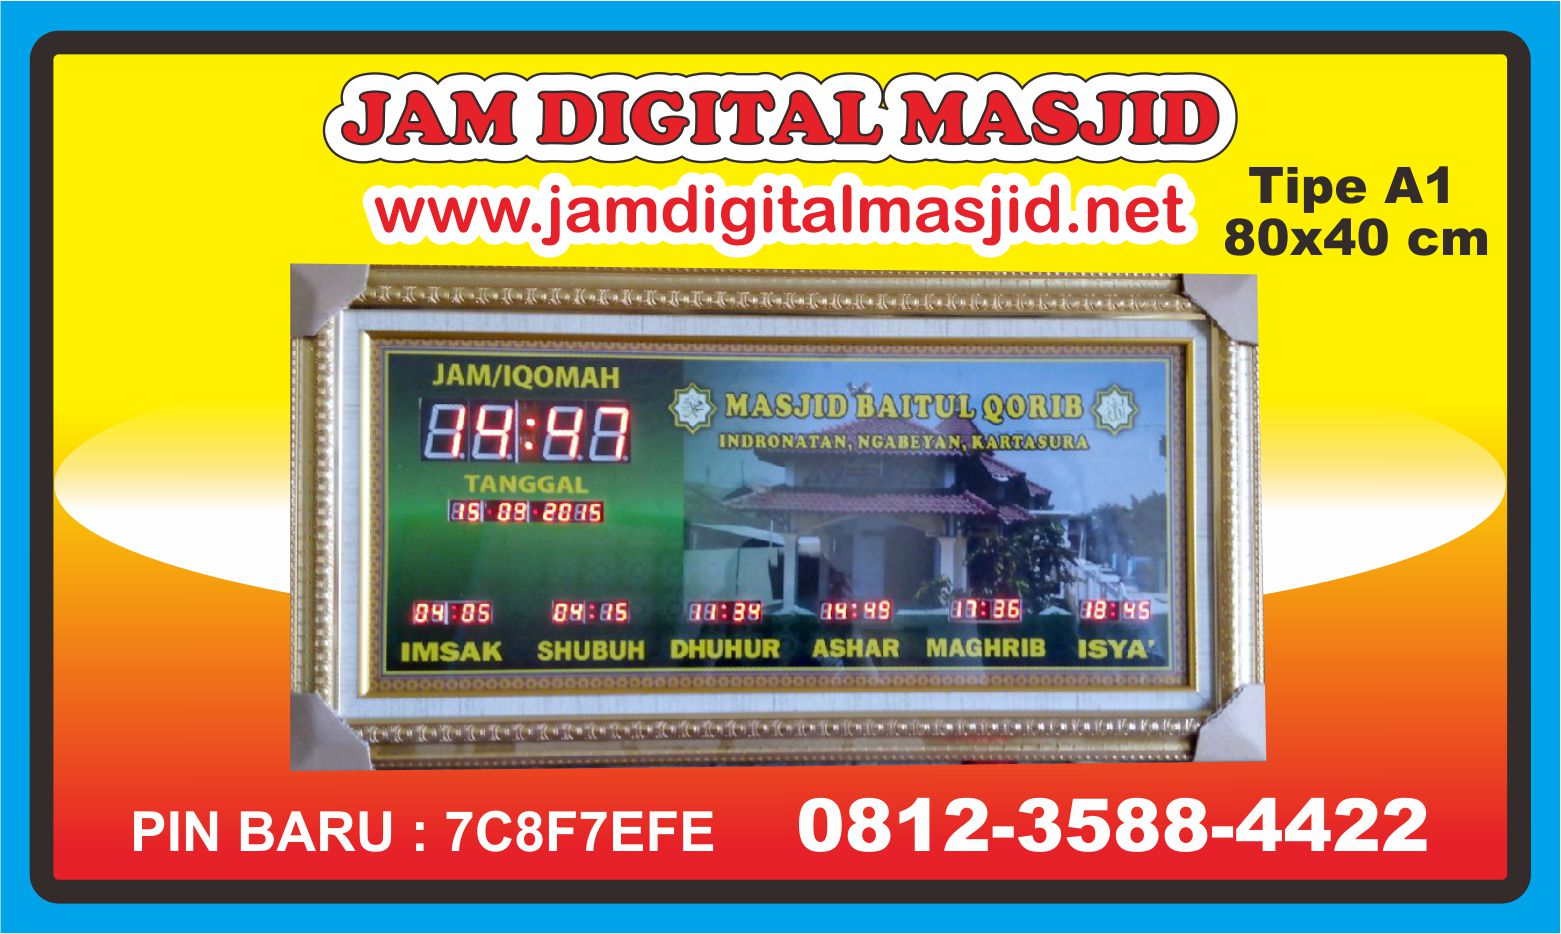 jam-digital-masjid-kartasura-solo-jateng-murah-otomatis